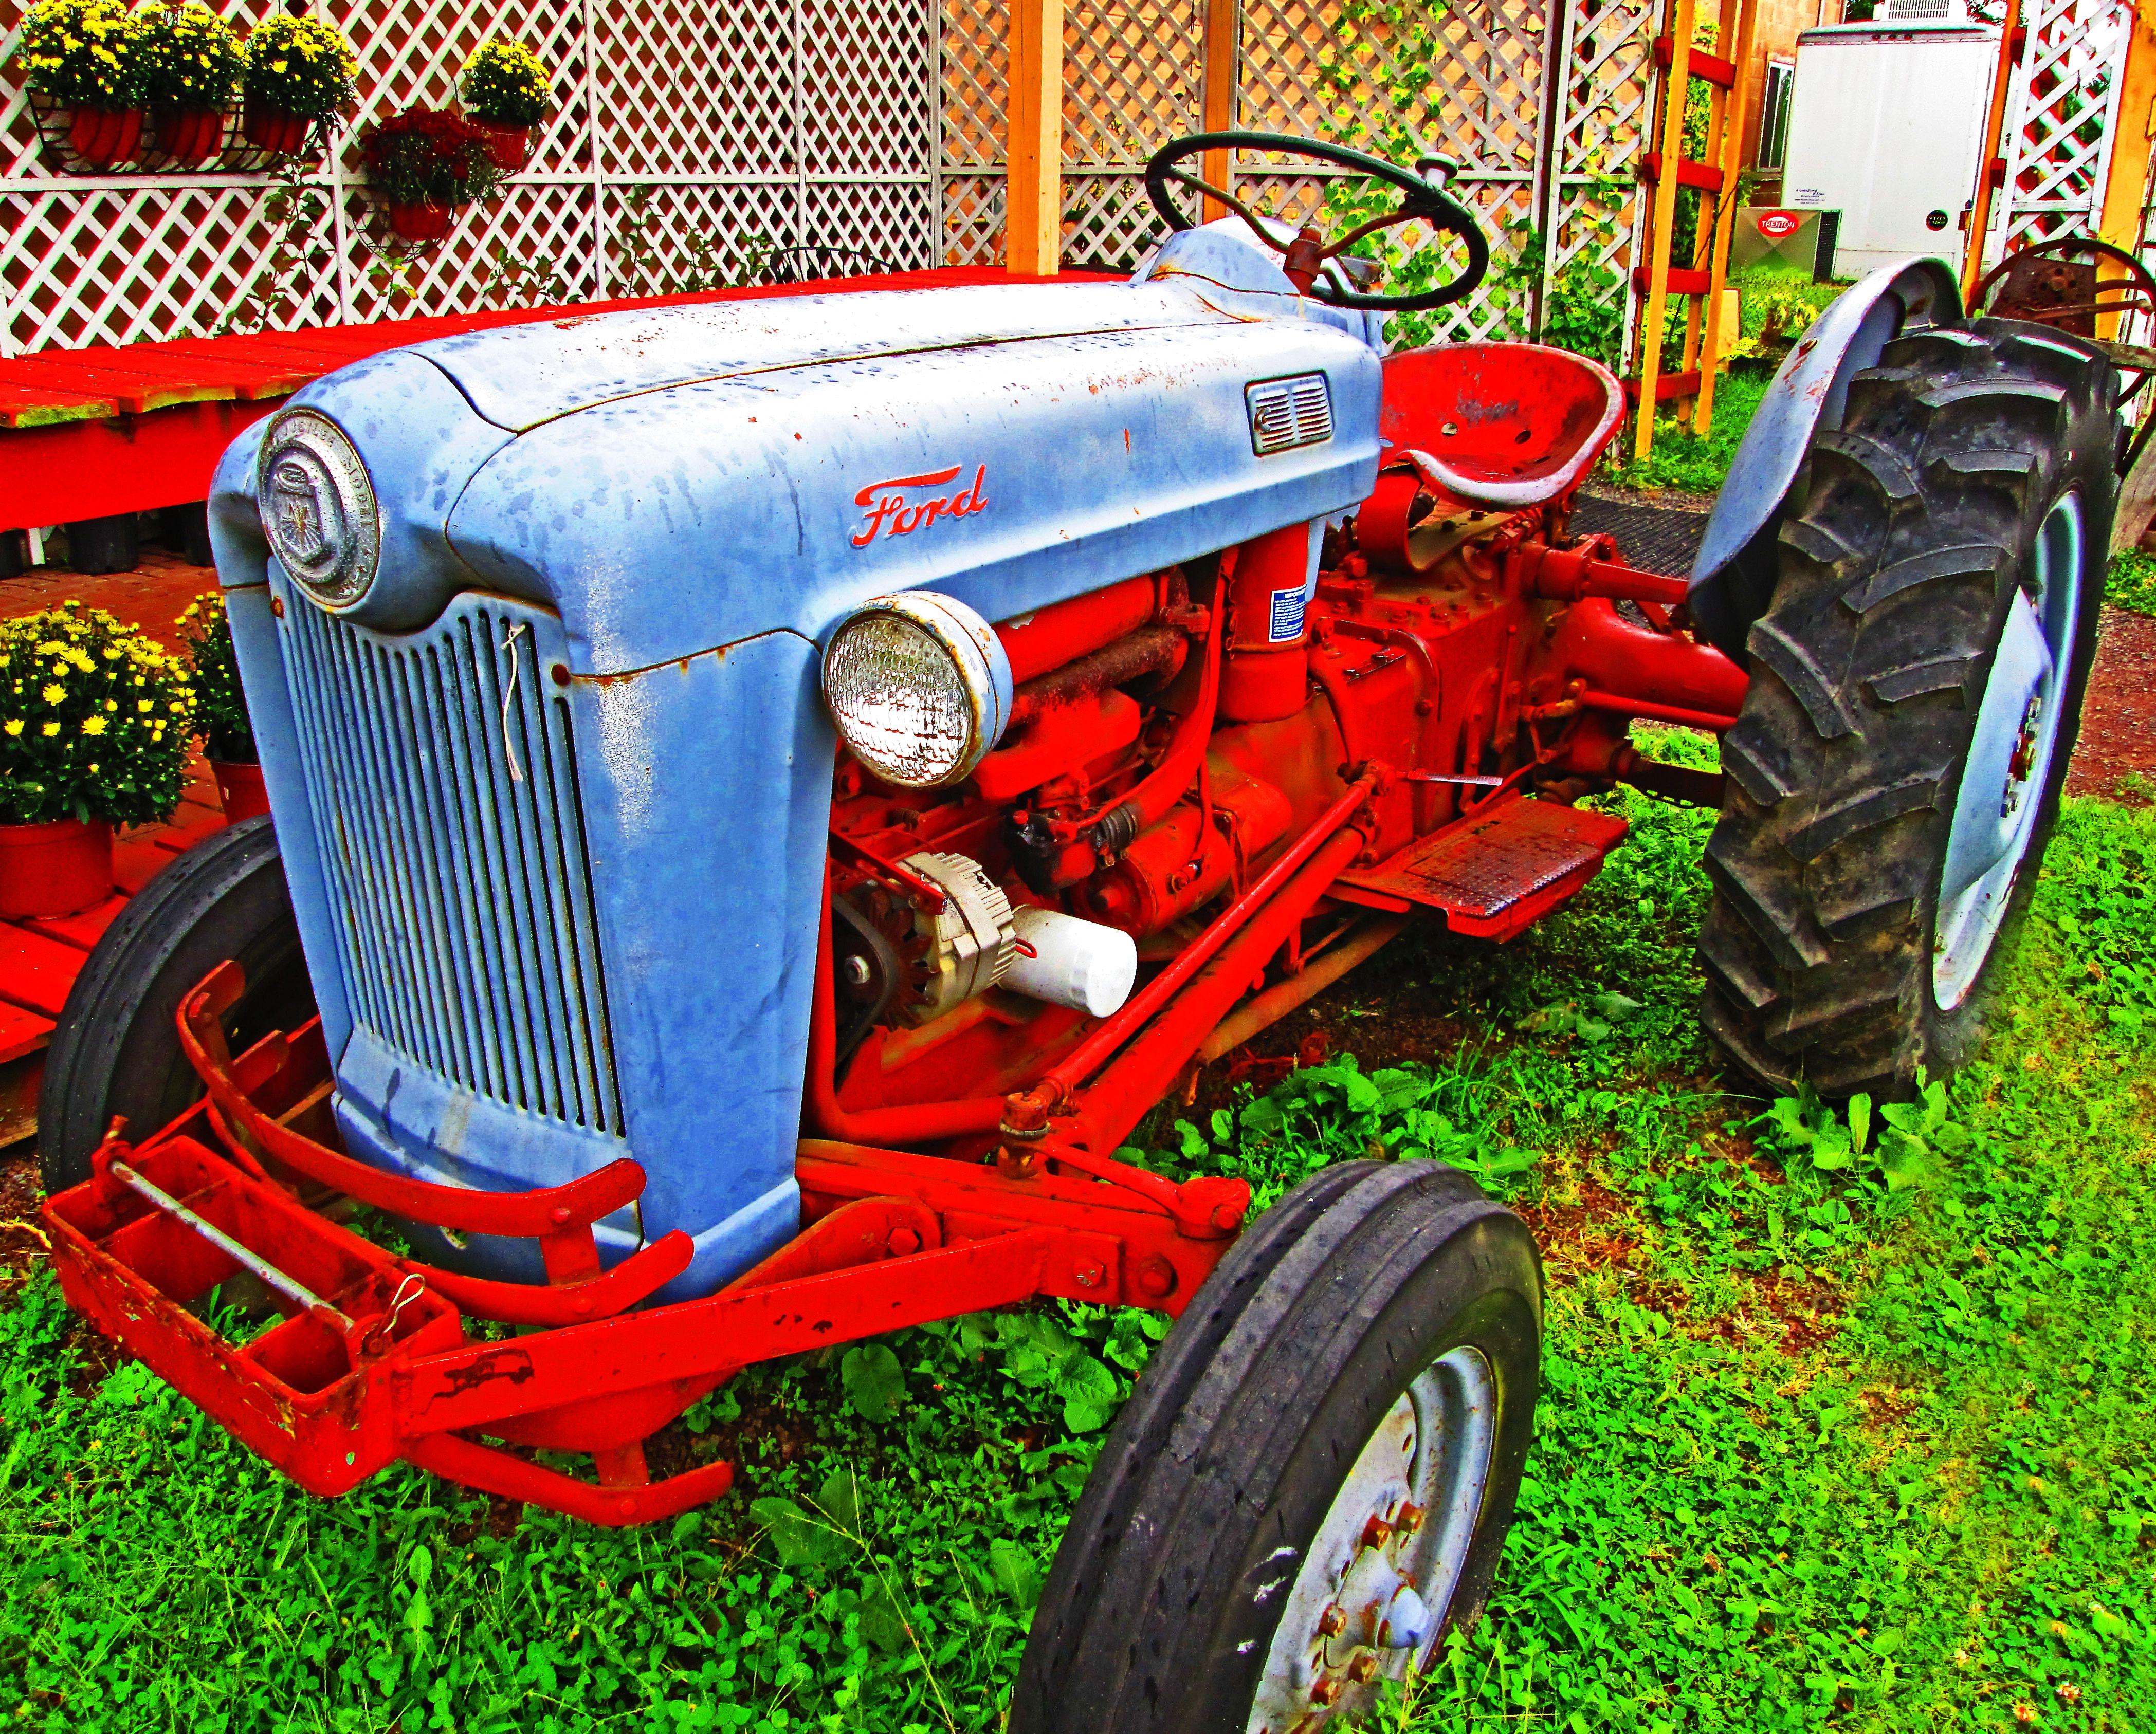 1953 Golden Jubilee Ford Tractor Love S Photo Album Tractors Ford Tractors 8n Ford Tractor